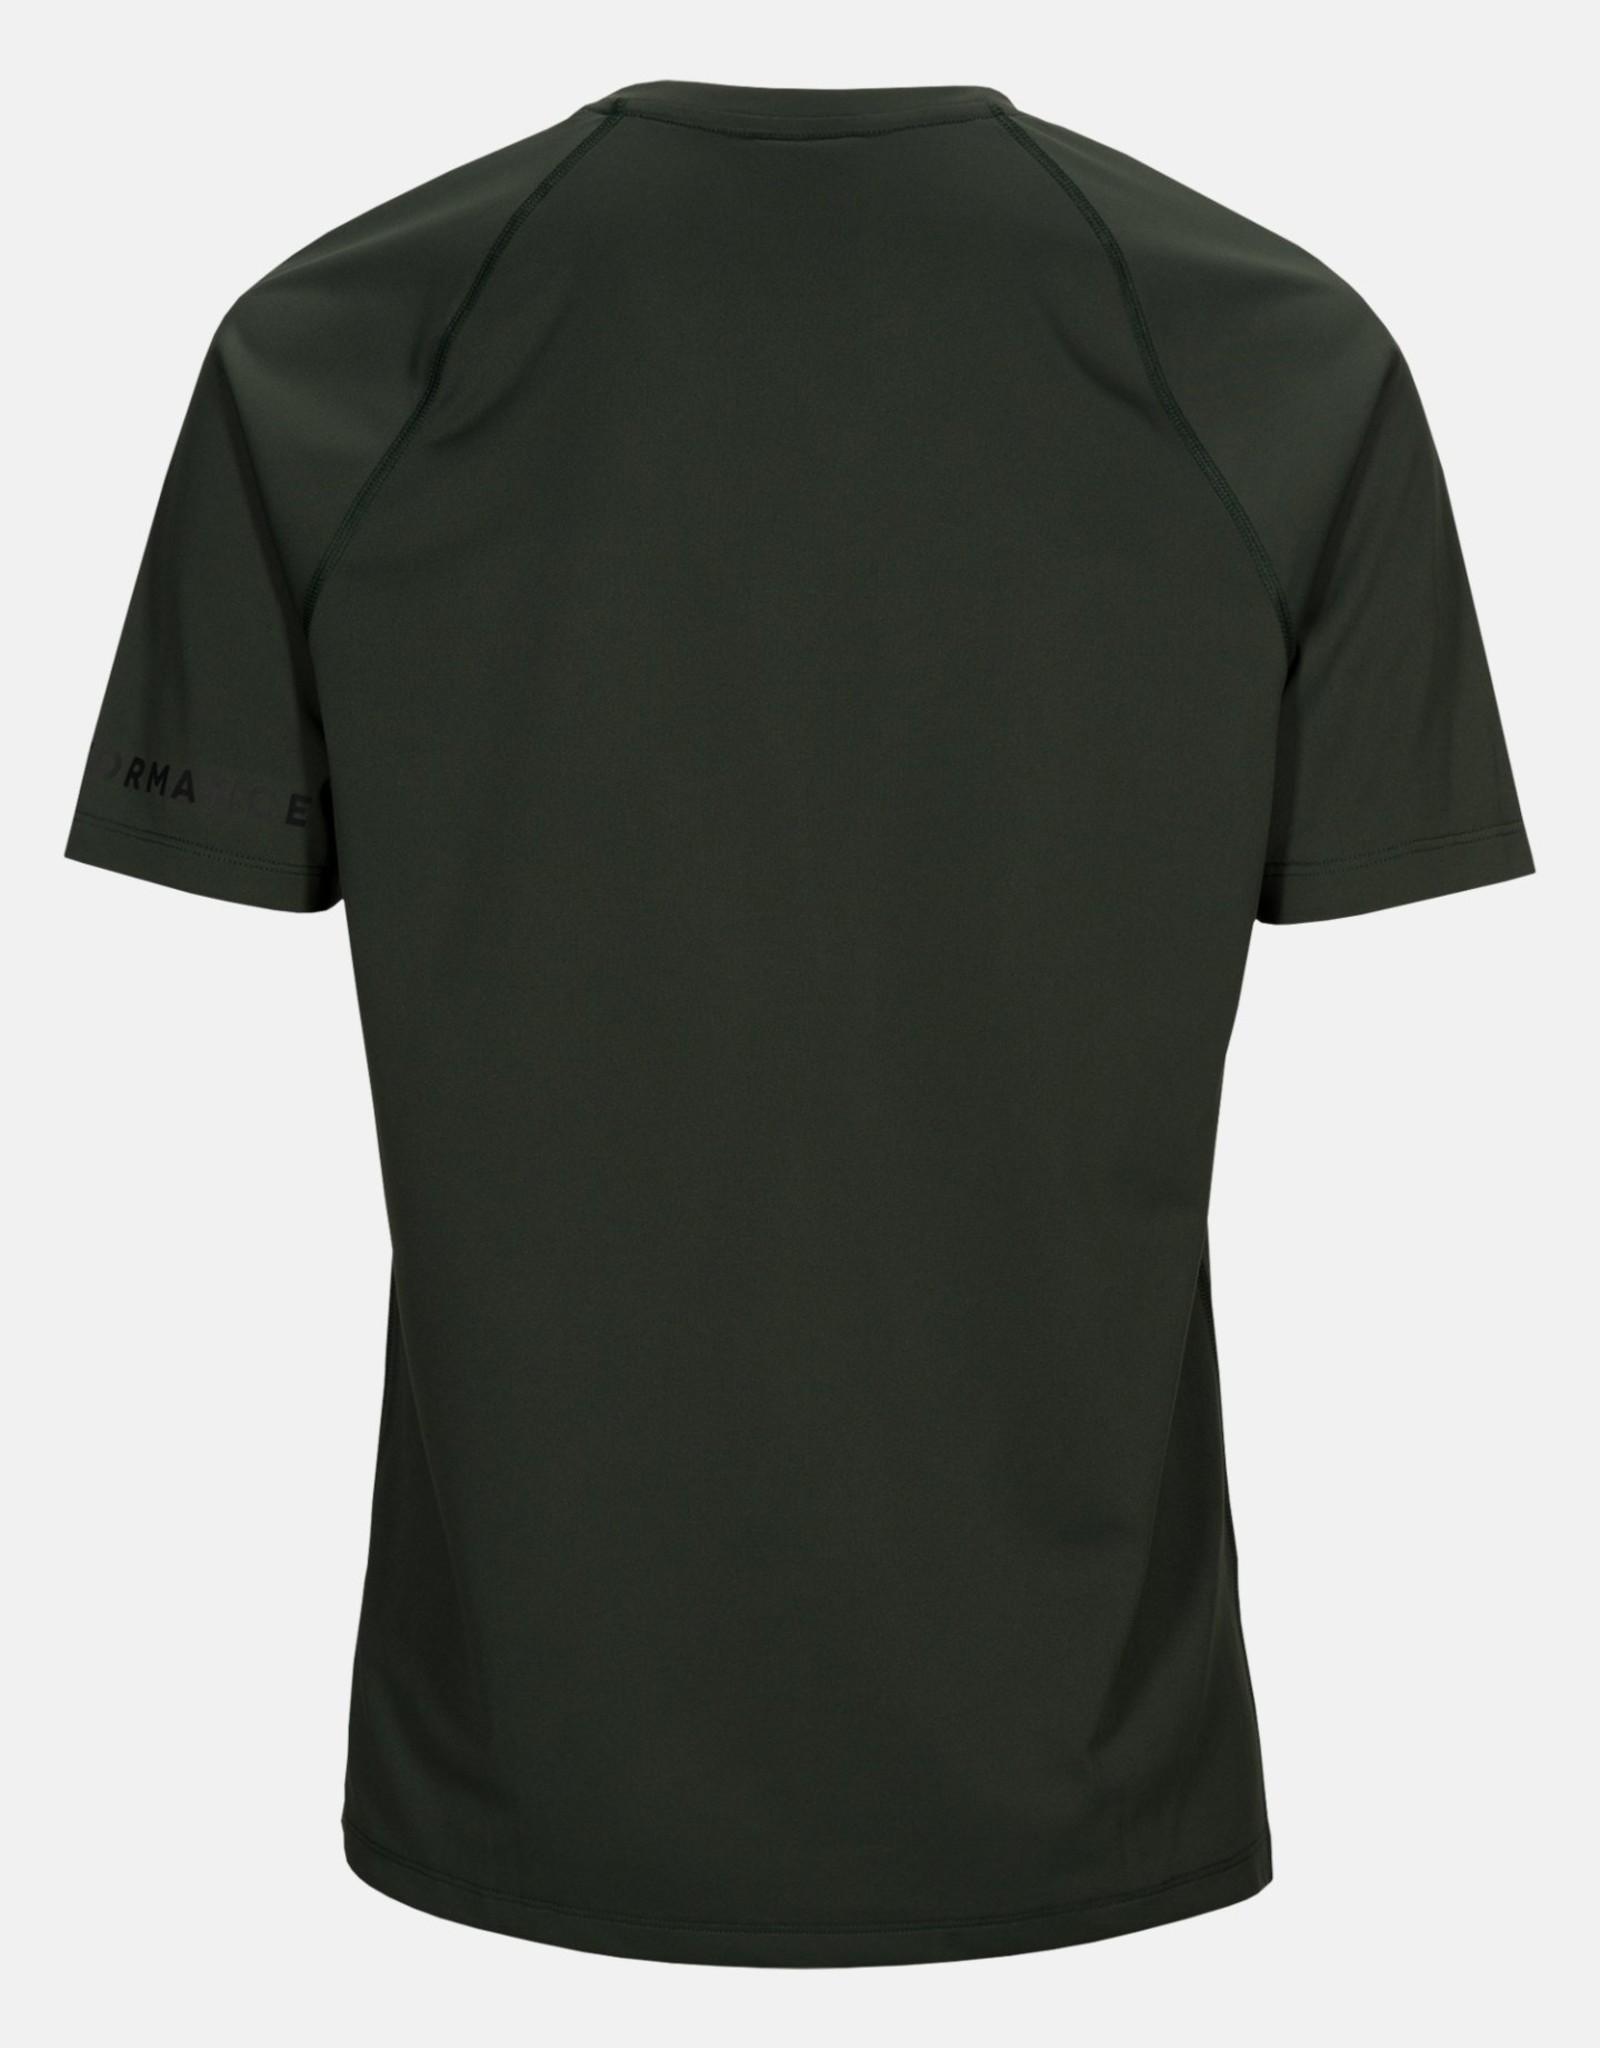 Peak Performance Peak Performace Men's Pro CO2 Short Sleeve - S2020